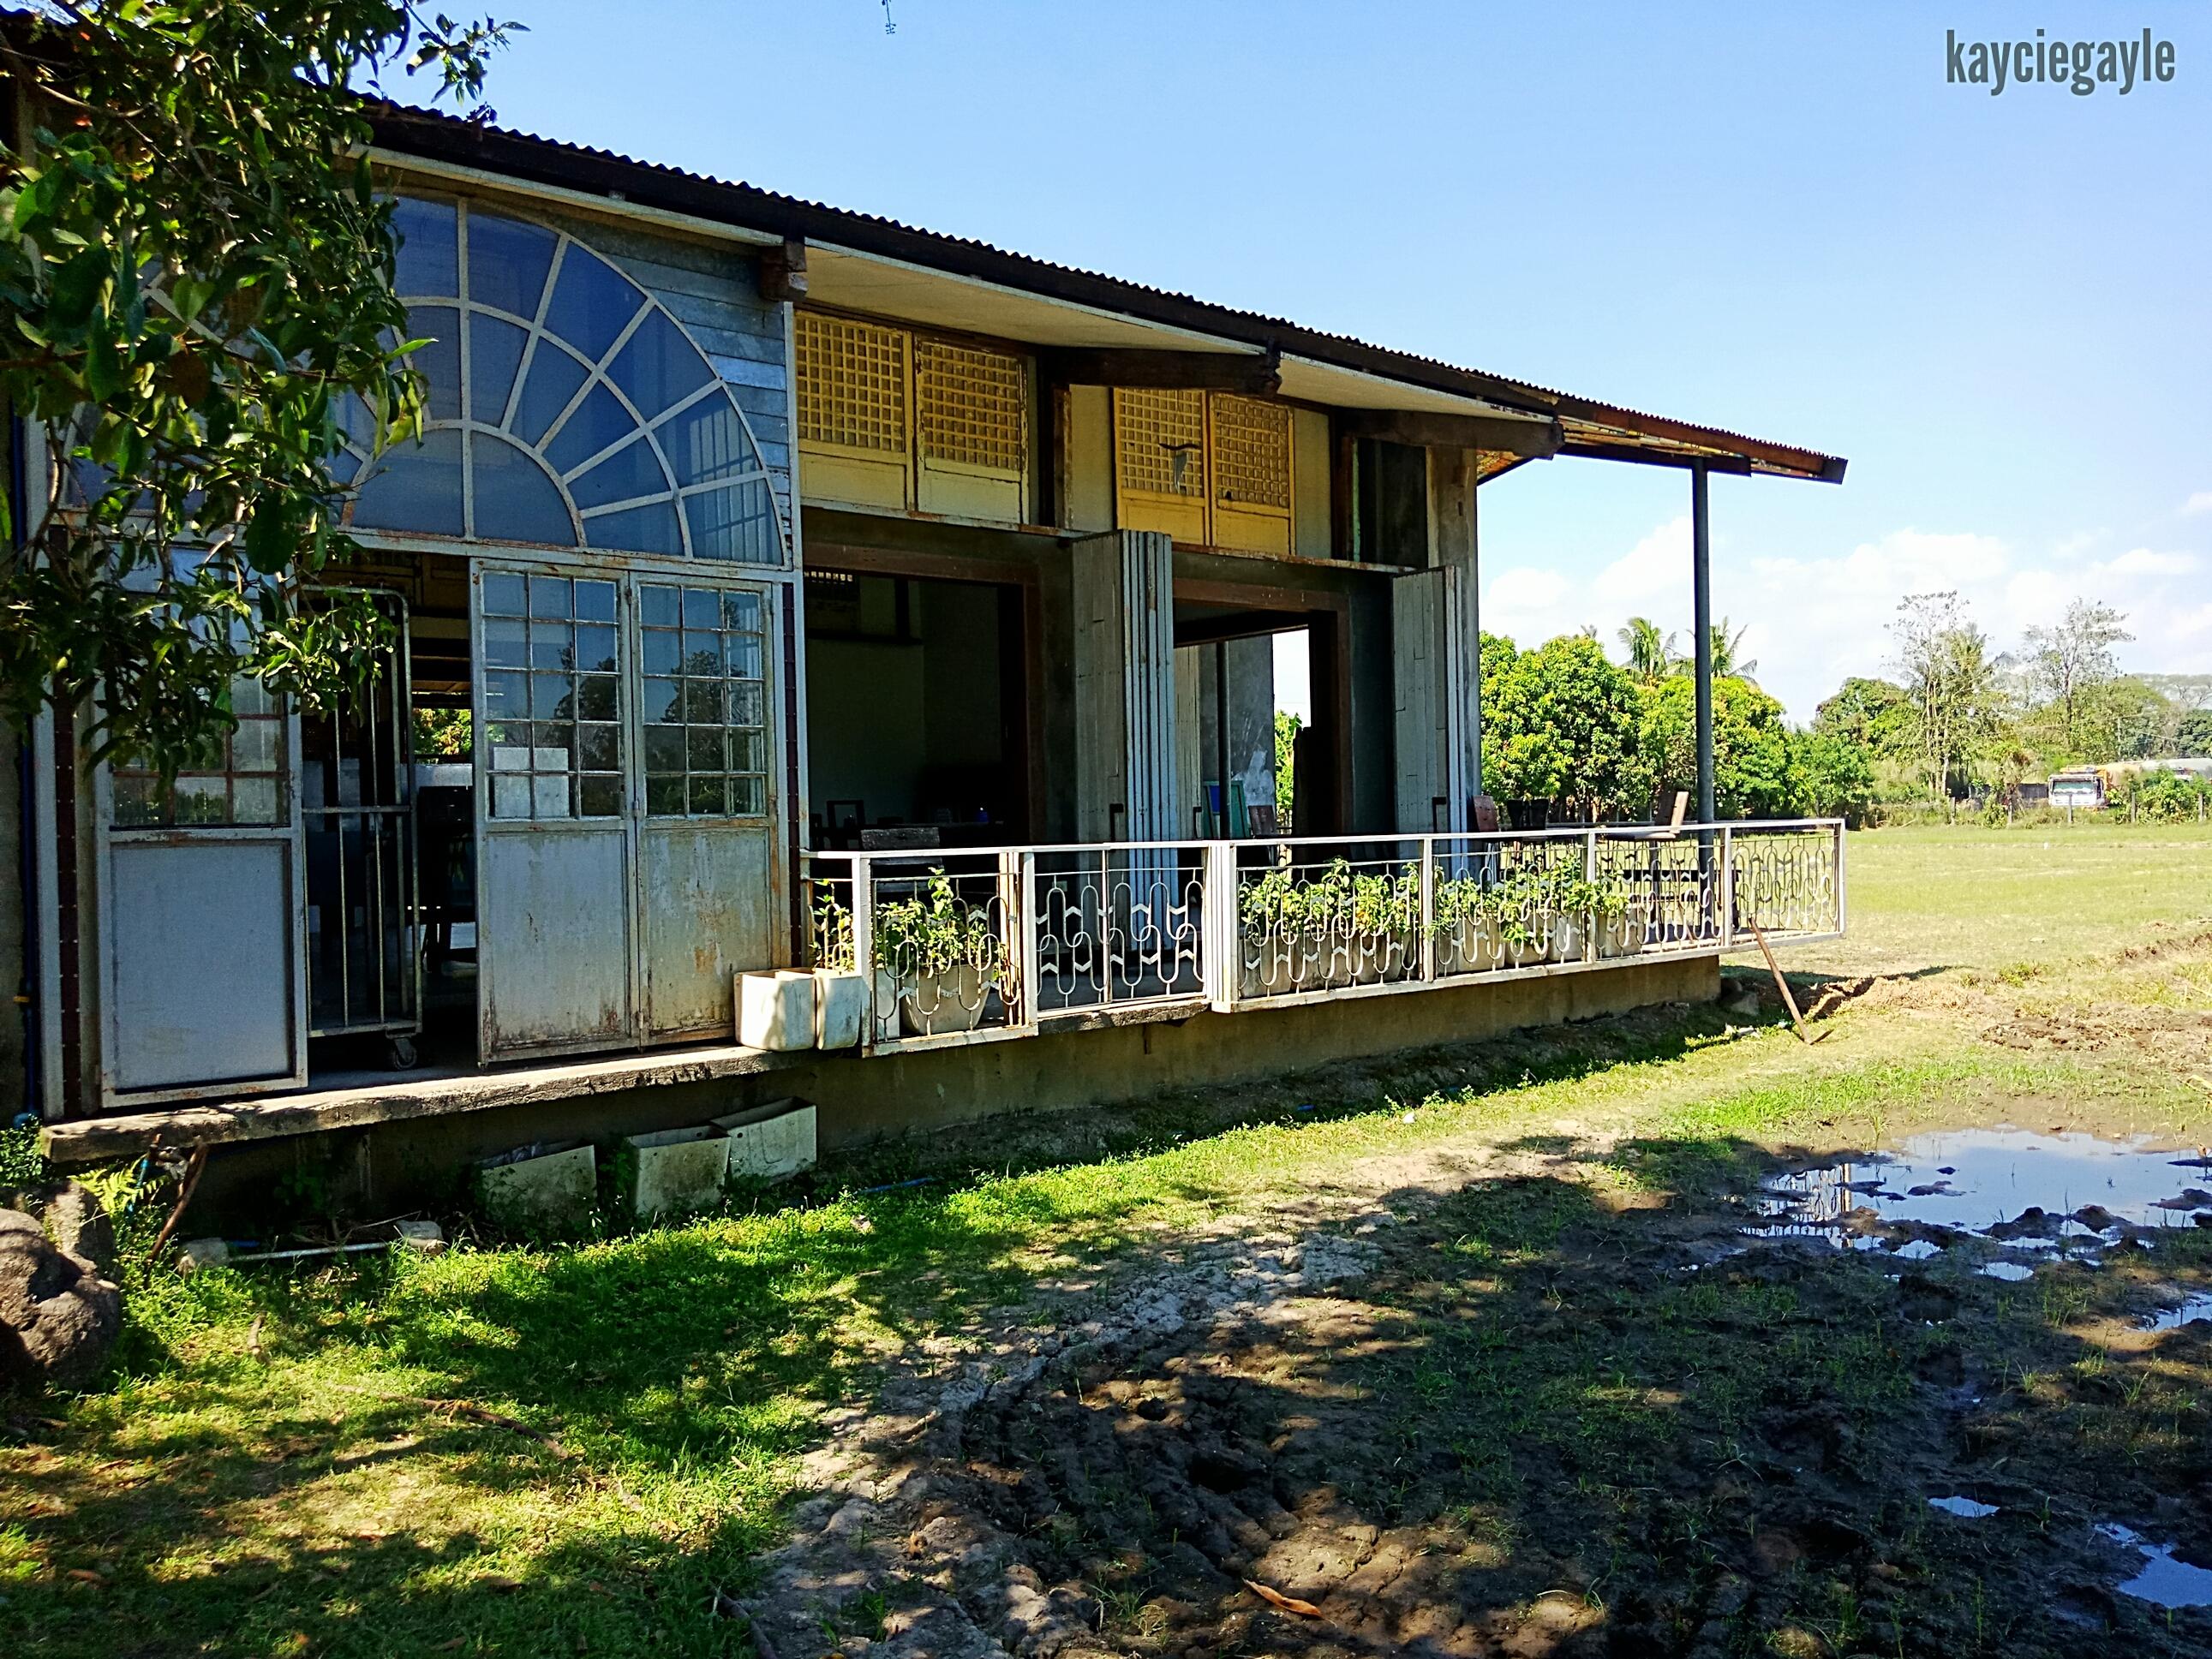 Hacienda Tour at Prado Farm Lubao Pampanga Farmhouse